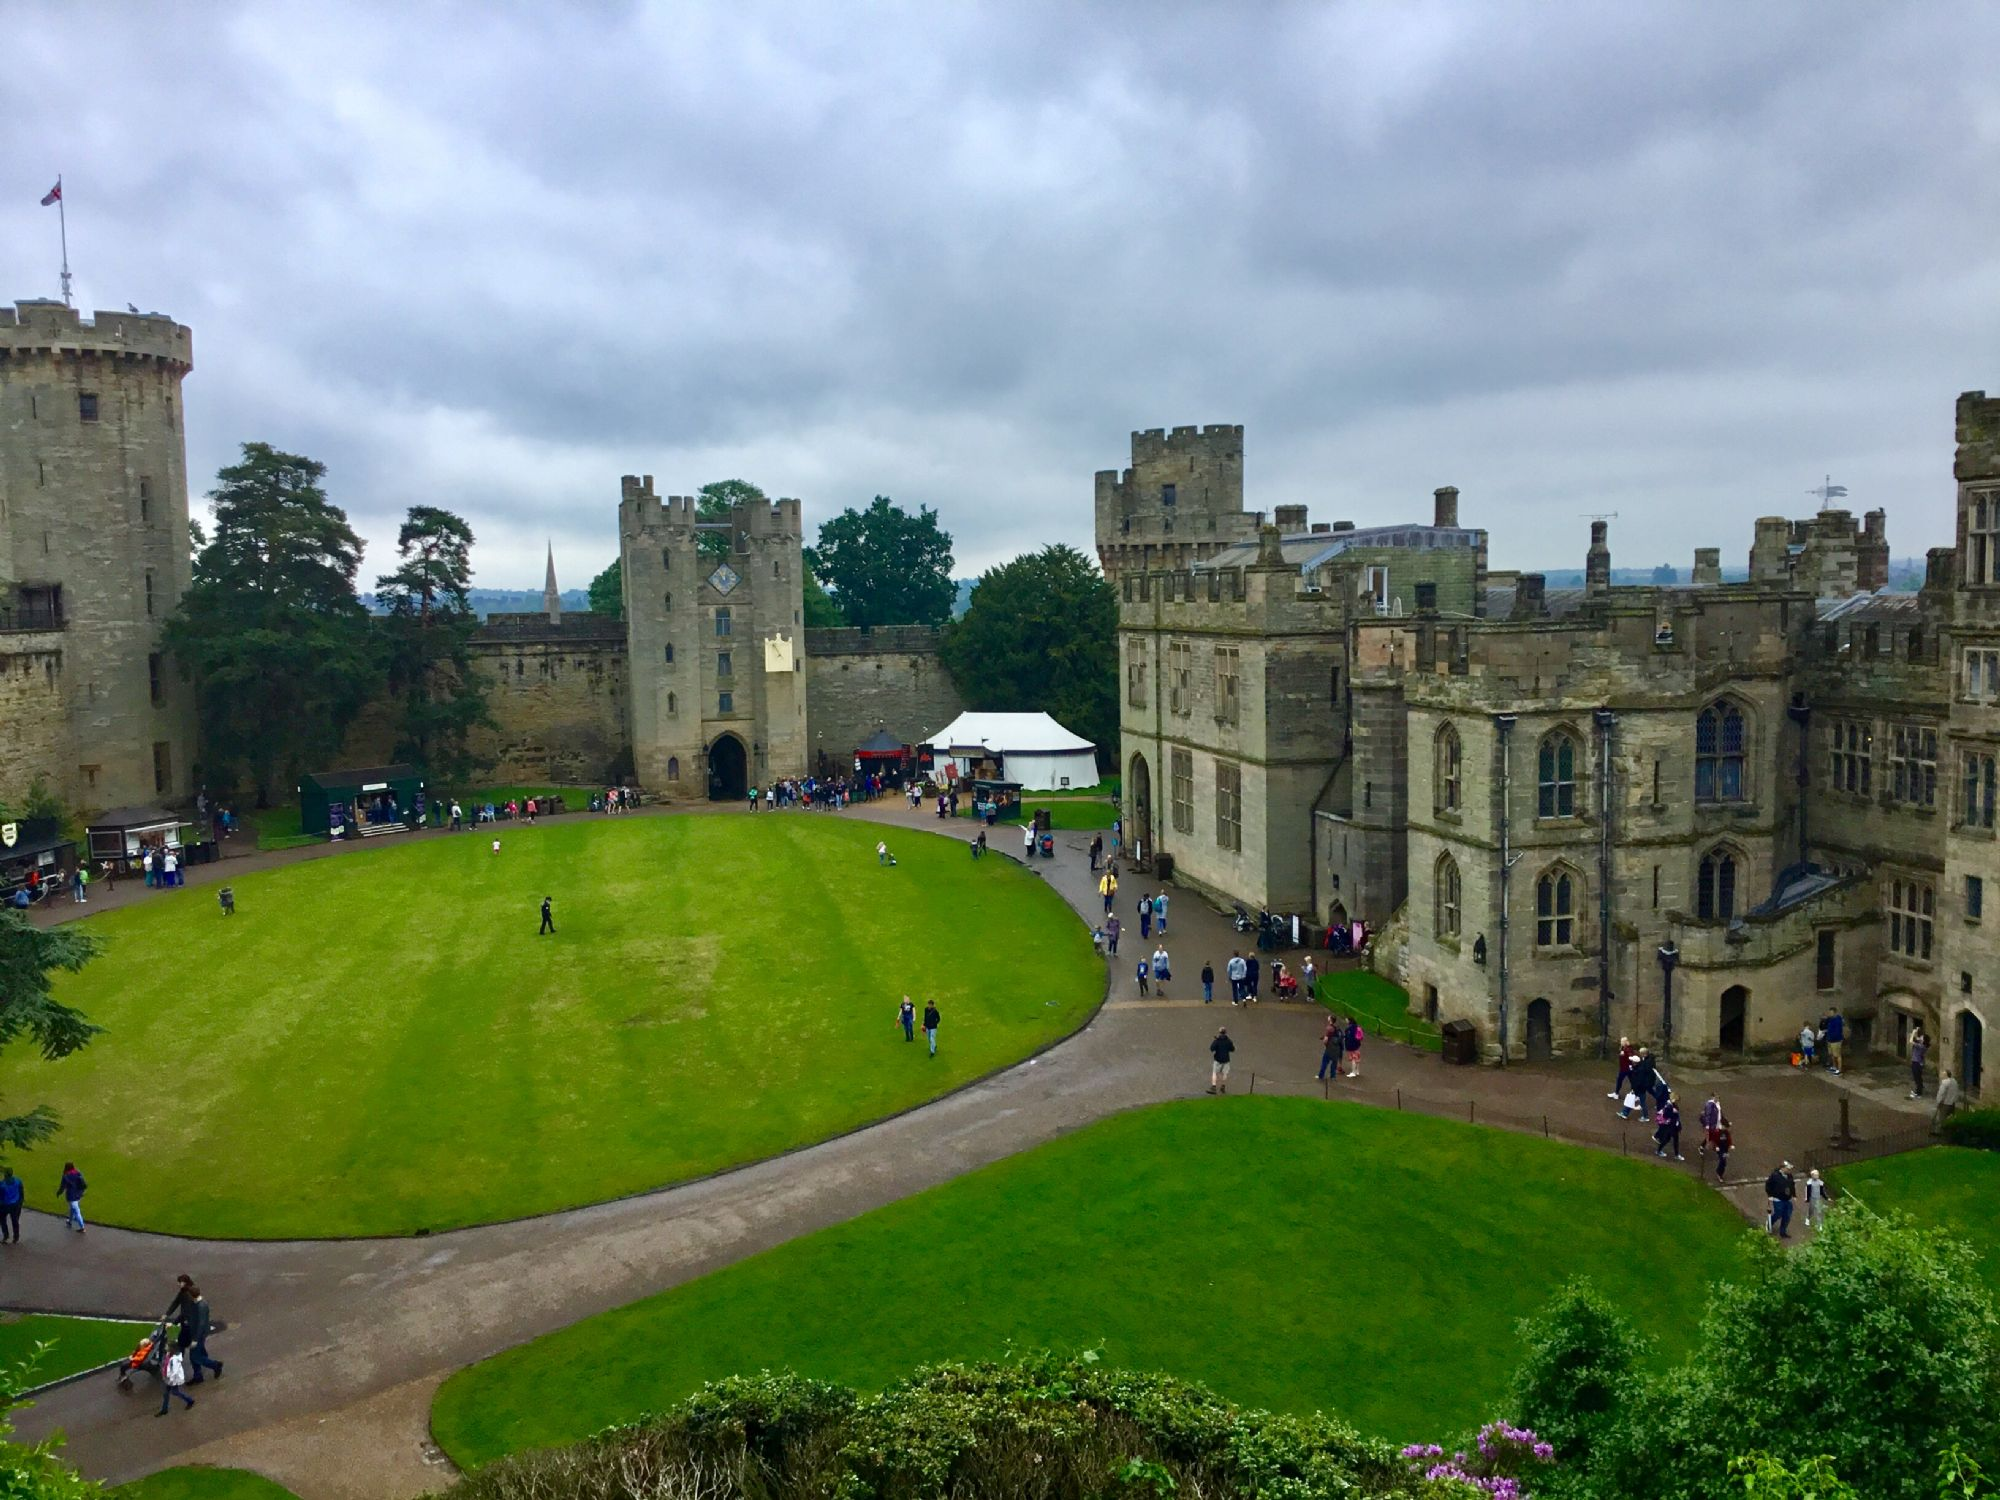 Warwick Castle as seen from th